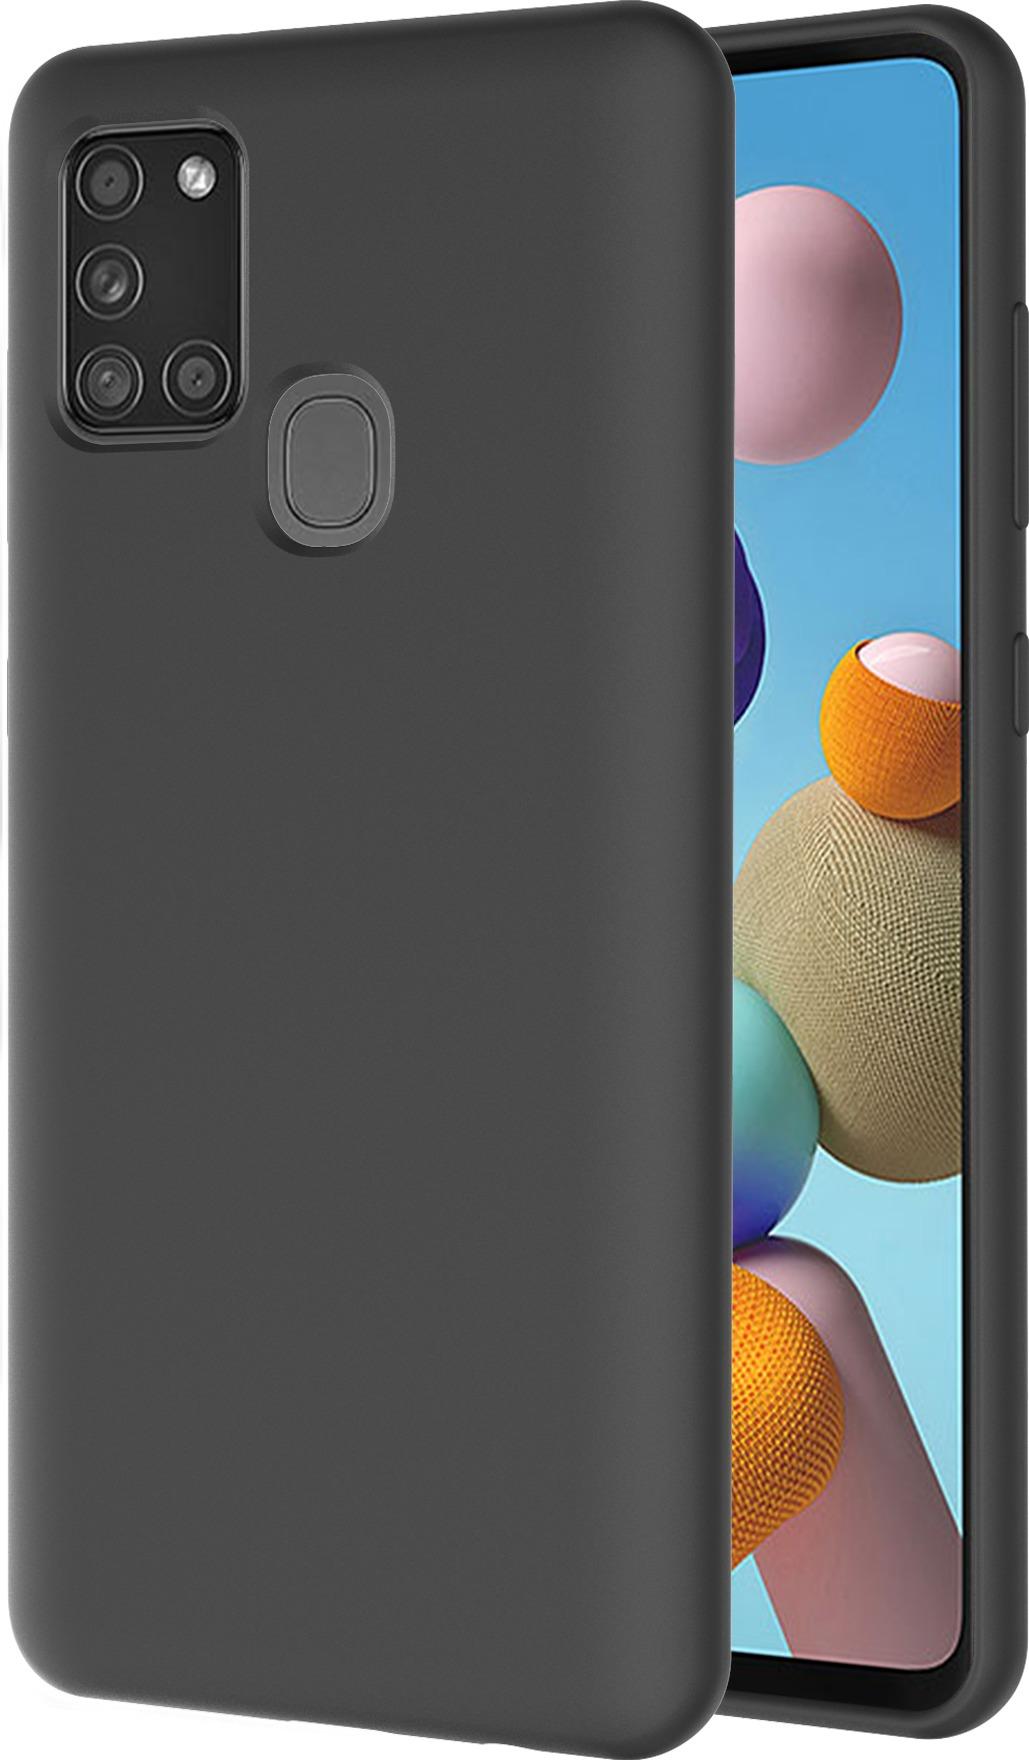 Azuri liquid silicon cover voor Samsung Galaxy A21s Telefoonhoesje Zwart